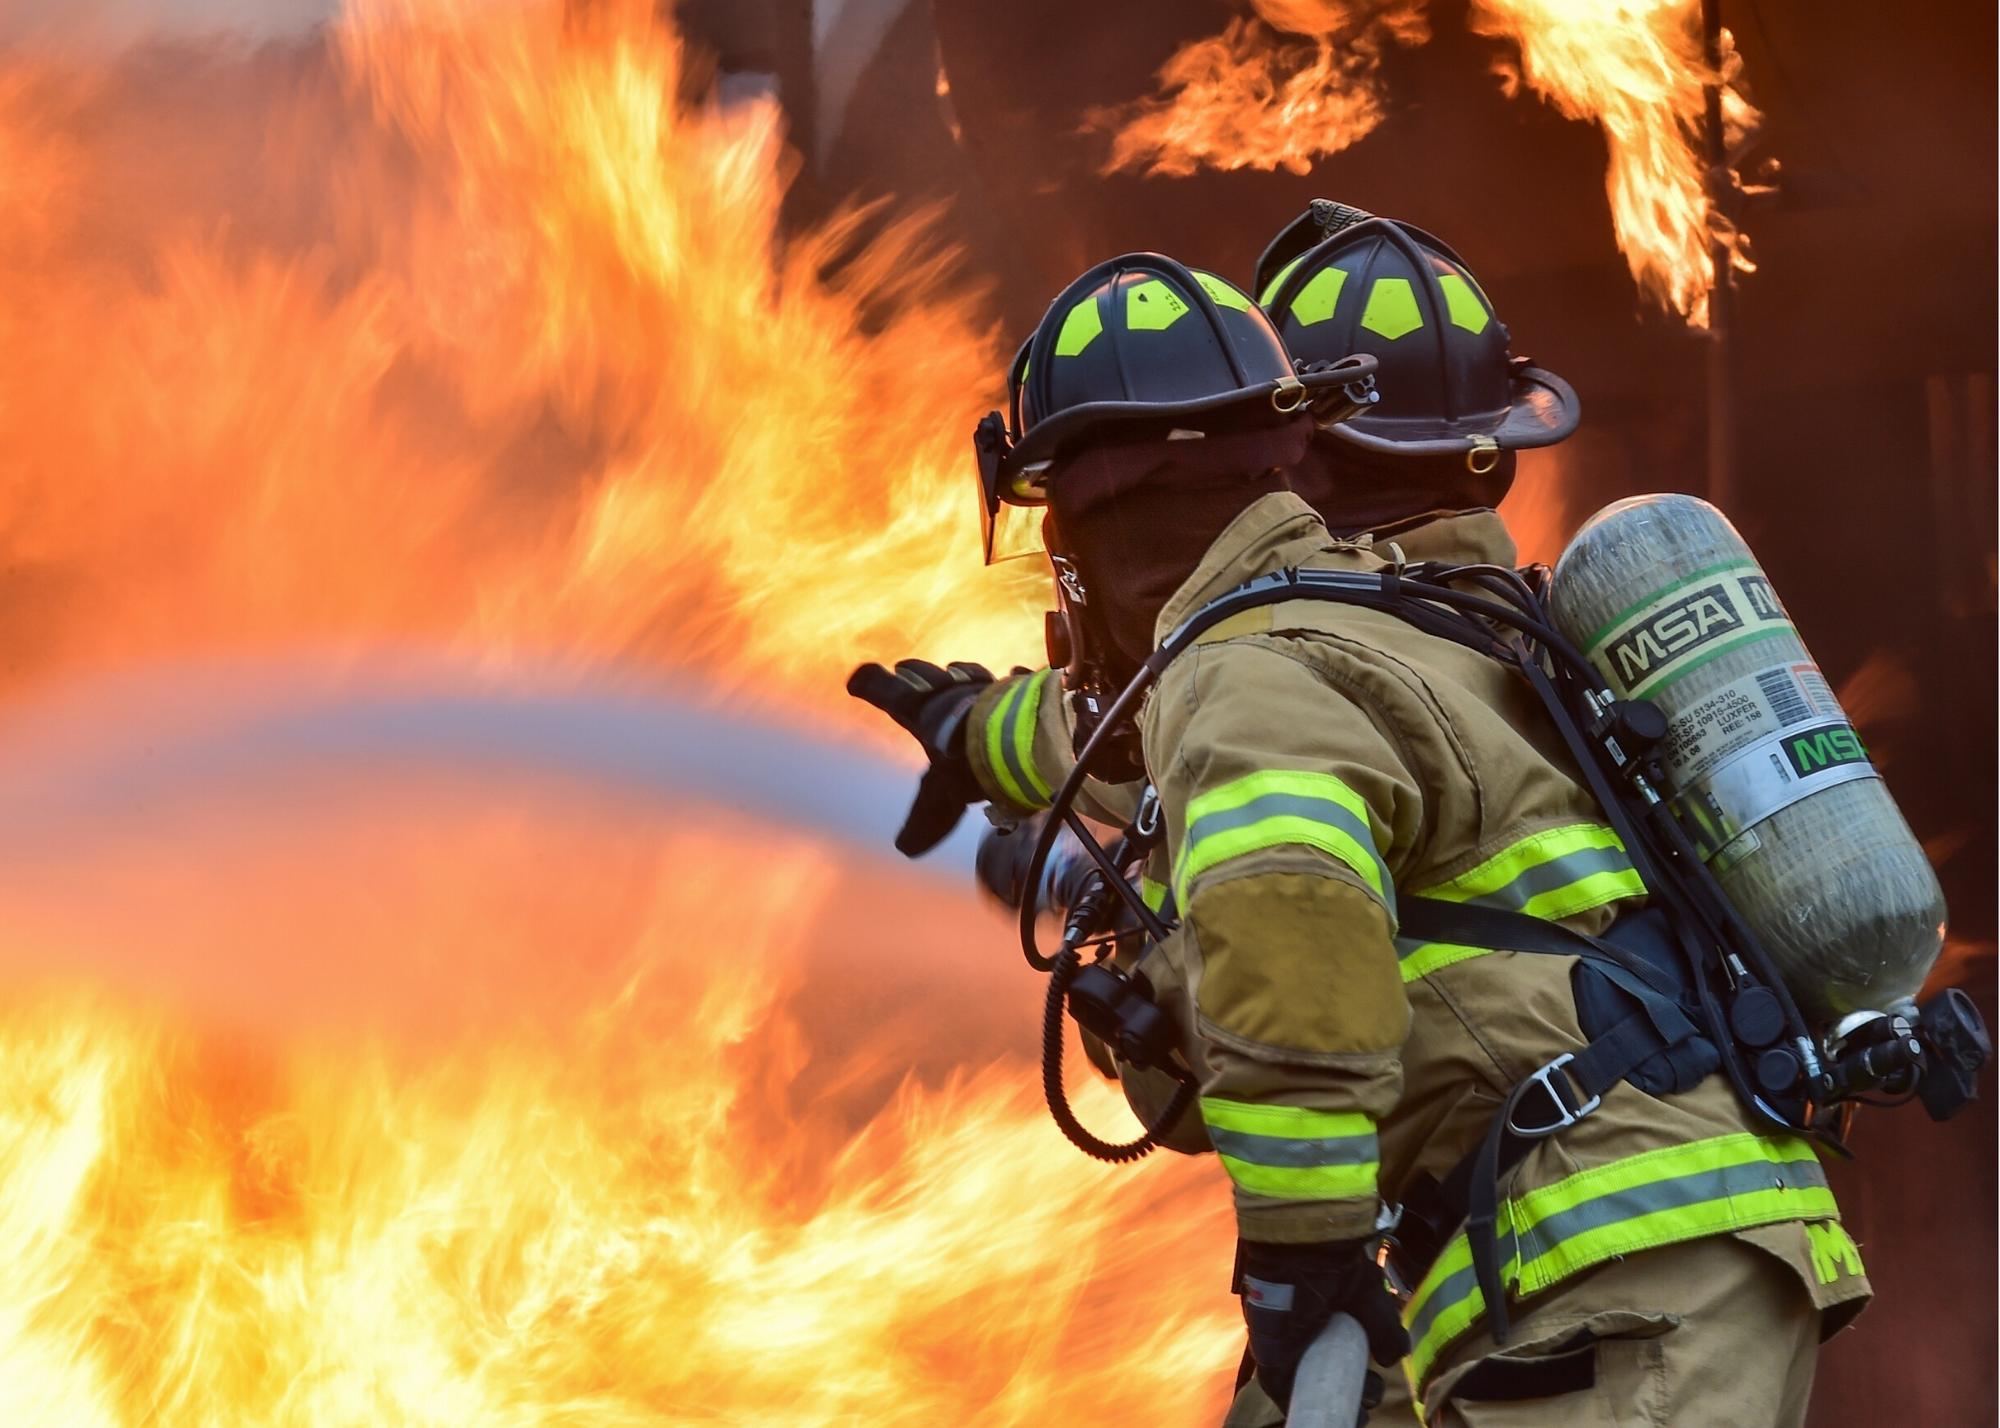 Firemen hosing down a fire